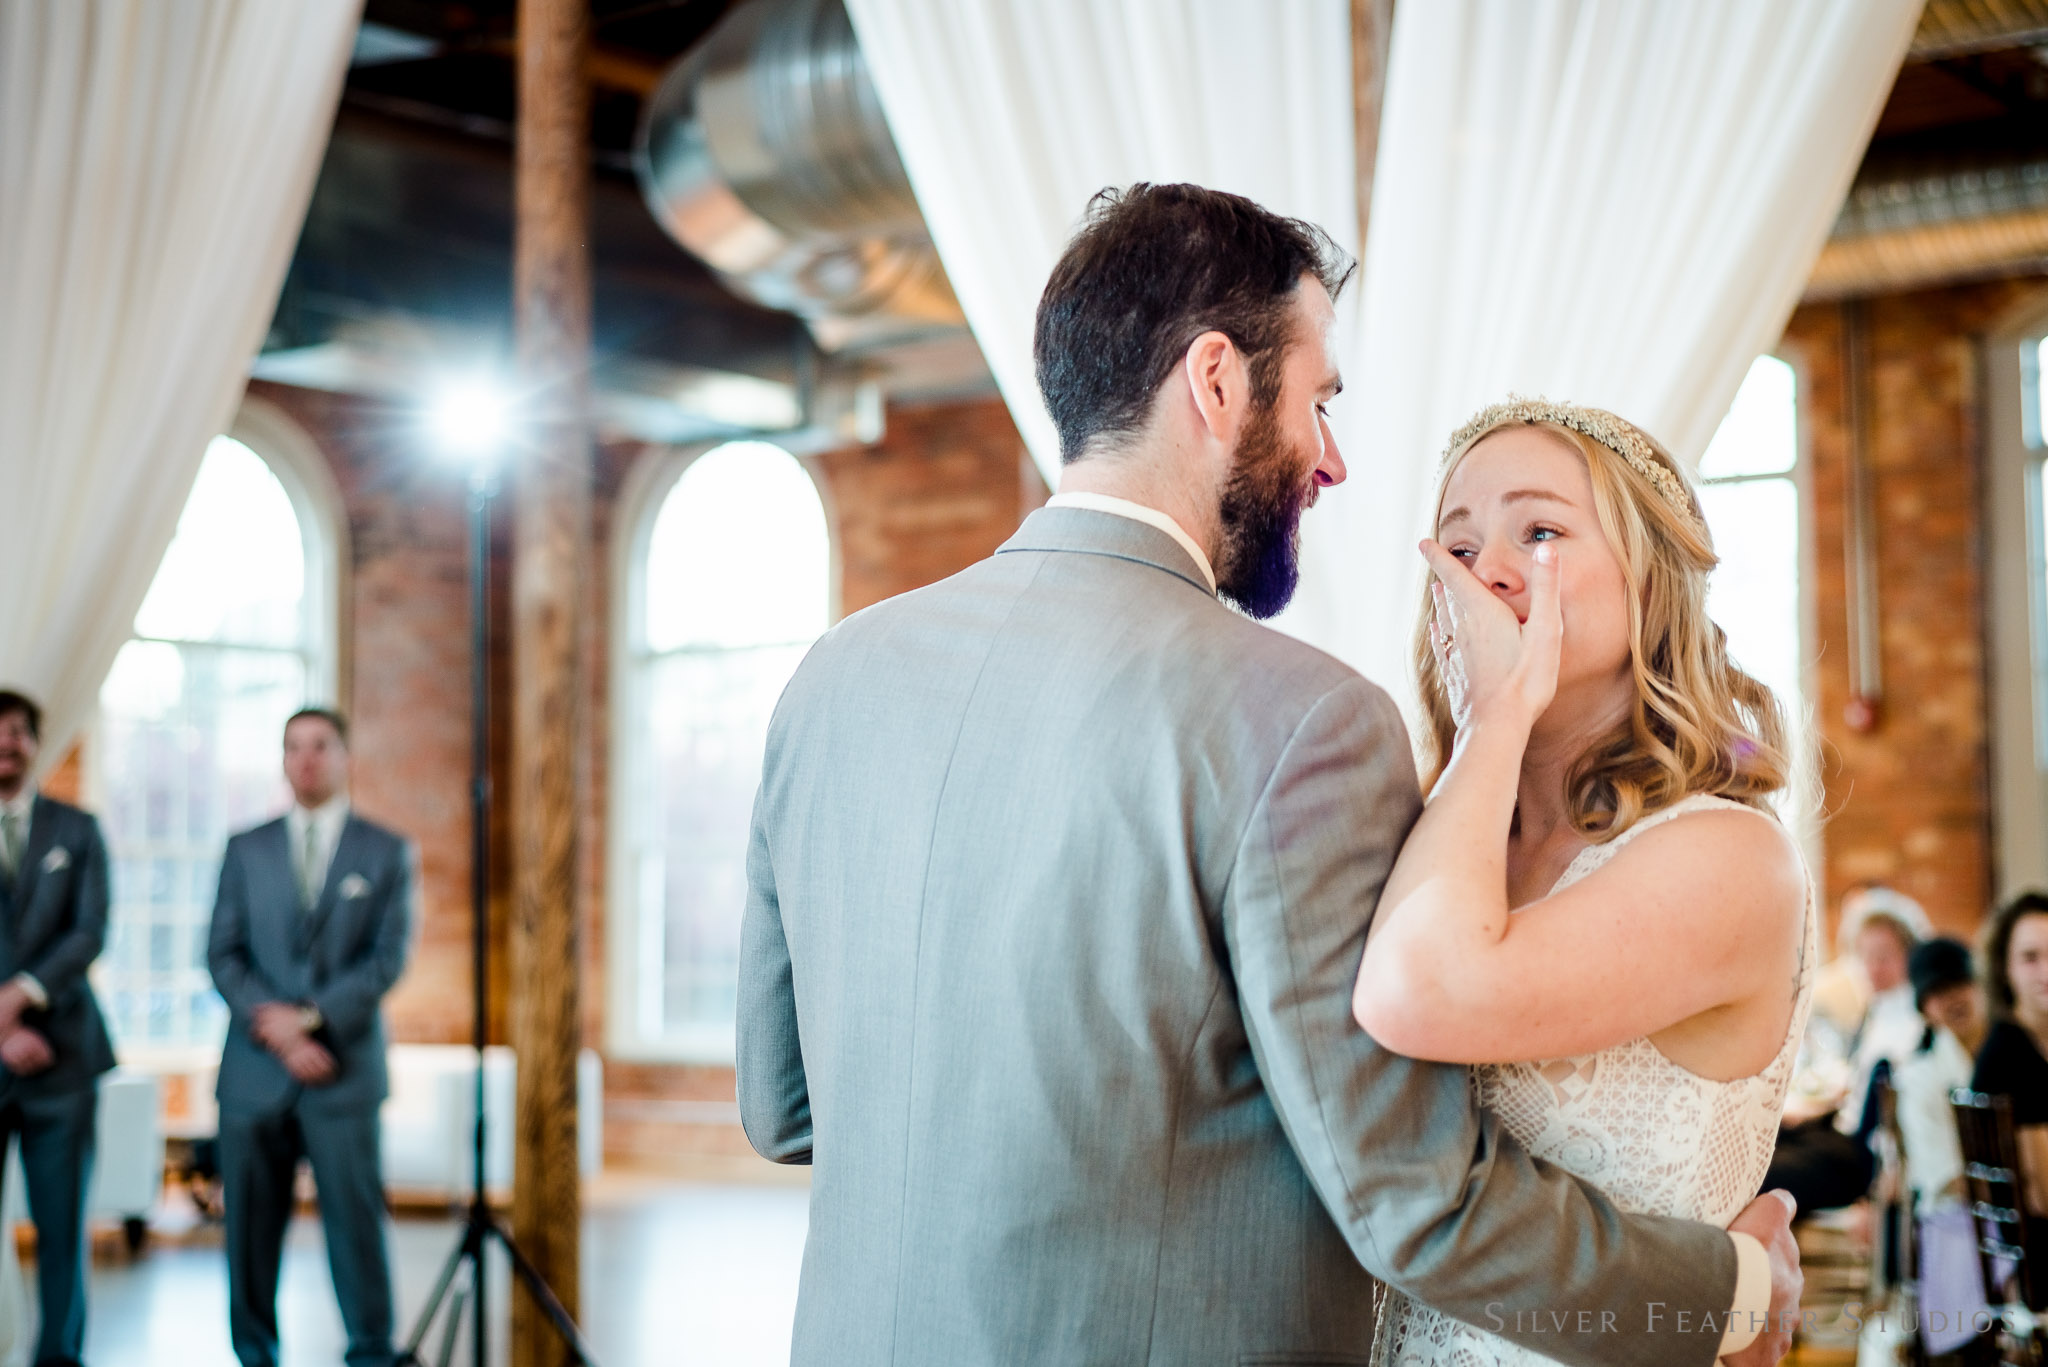 cotton-room-wedding-photography-056.jpg